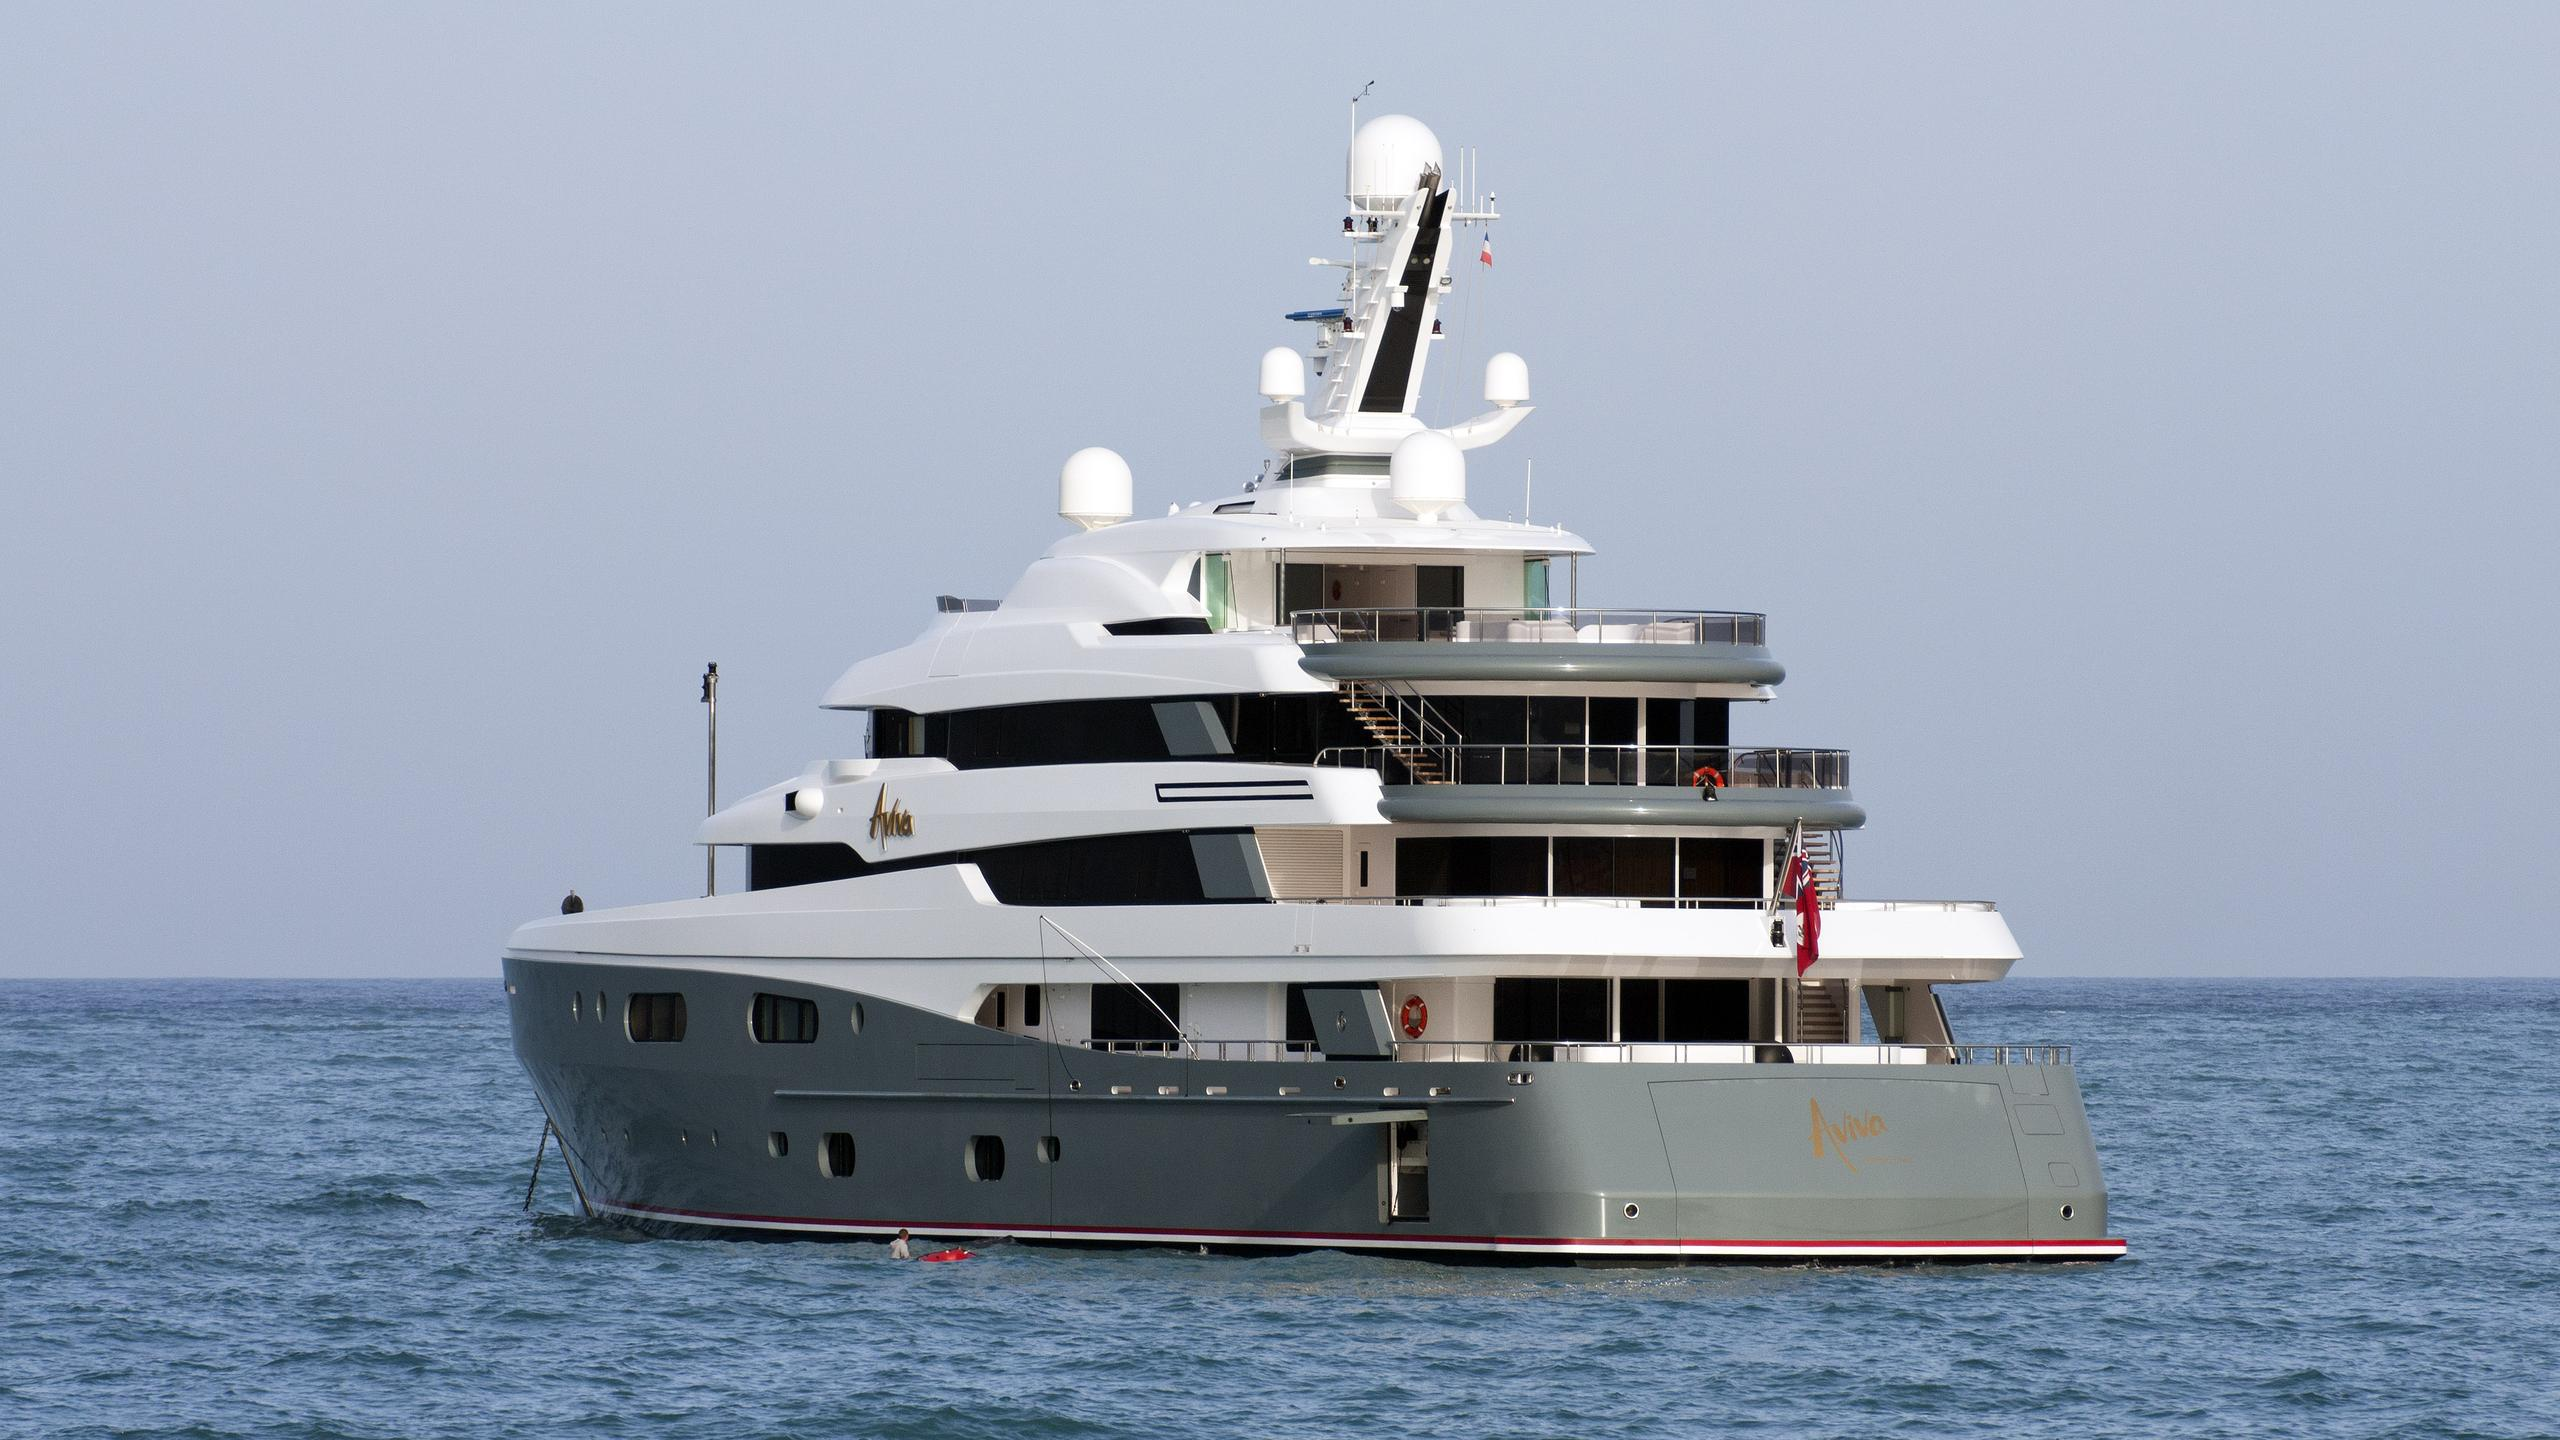 aviva-motor-yacht-abeking-rasmussen-2007-68m-stern